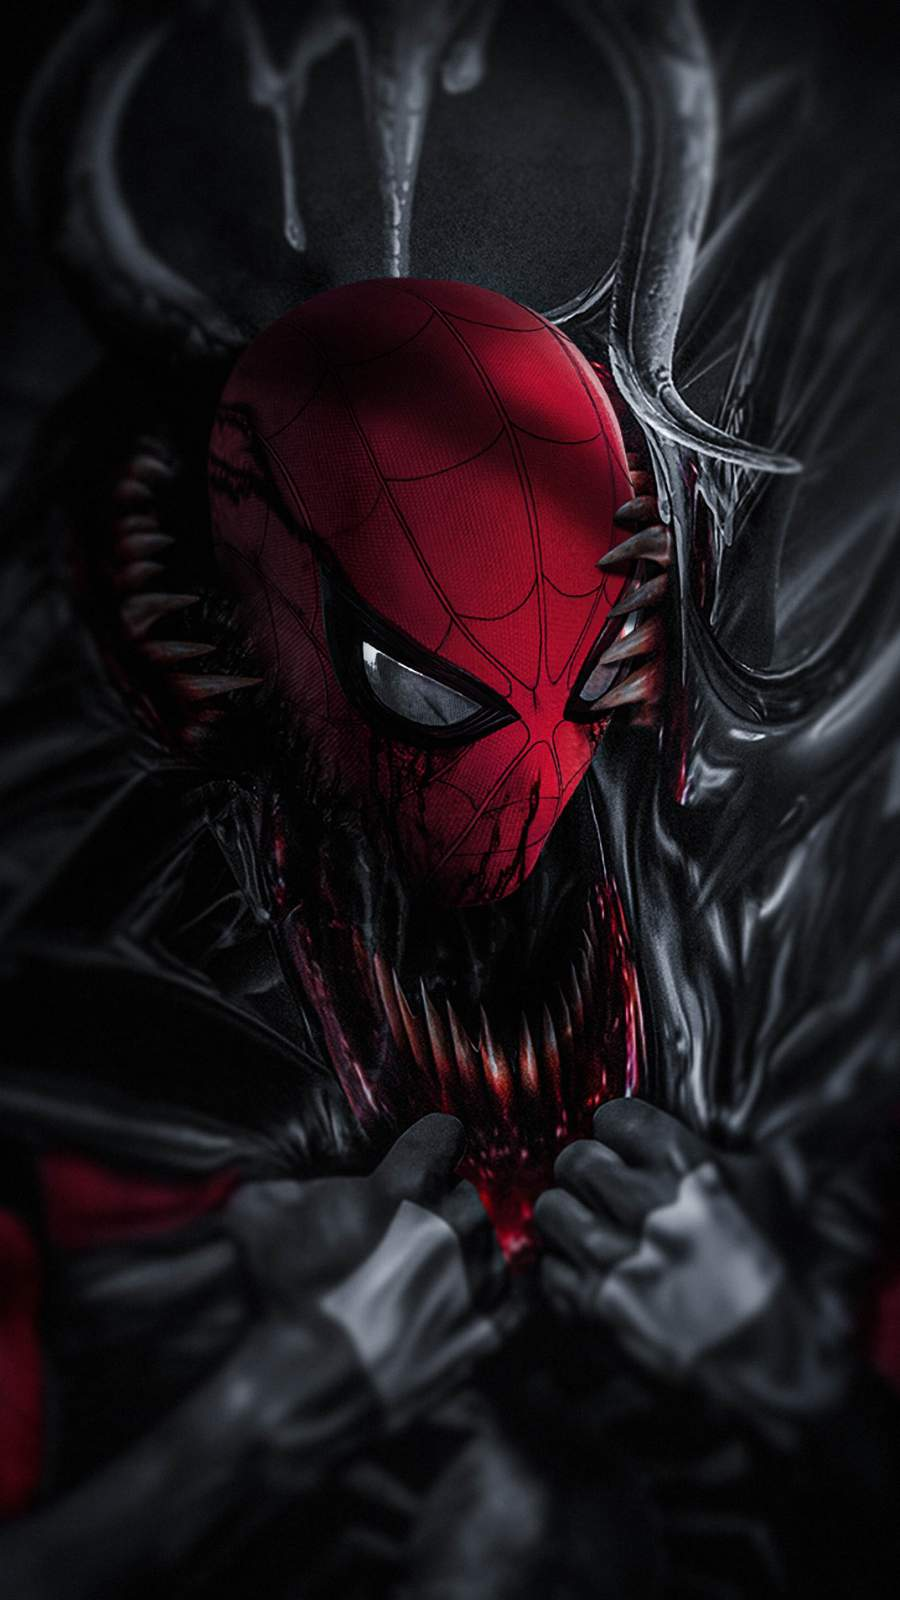 Venom vs Spiderman iPhone Wallpaper